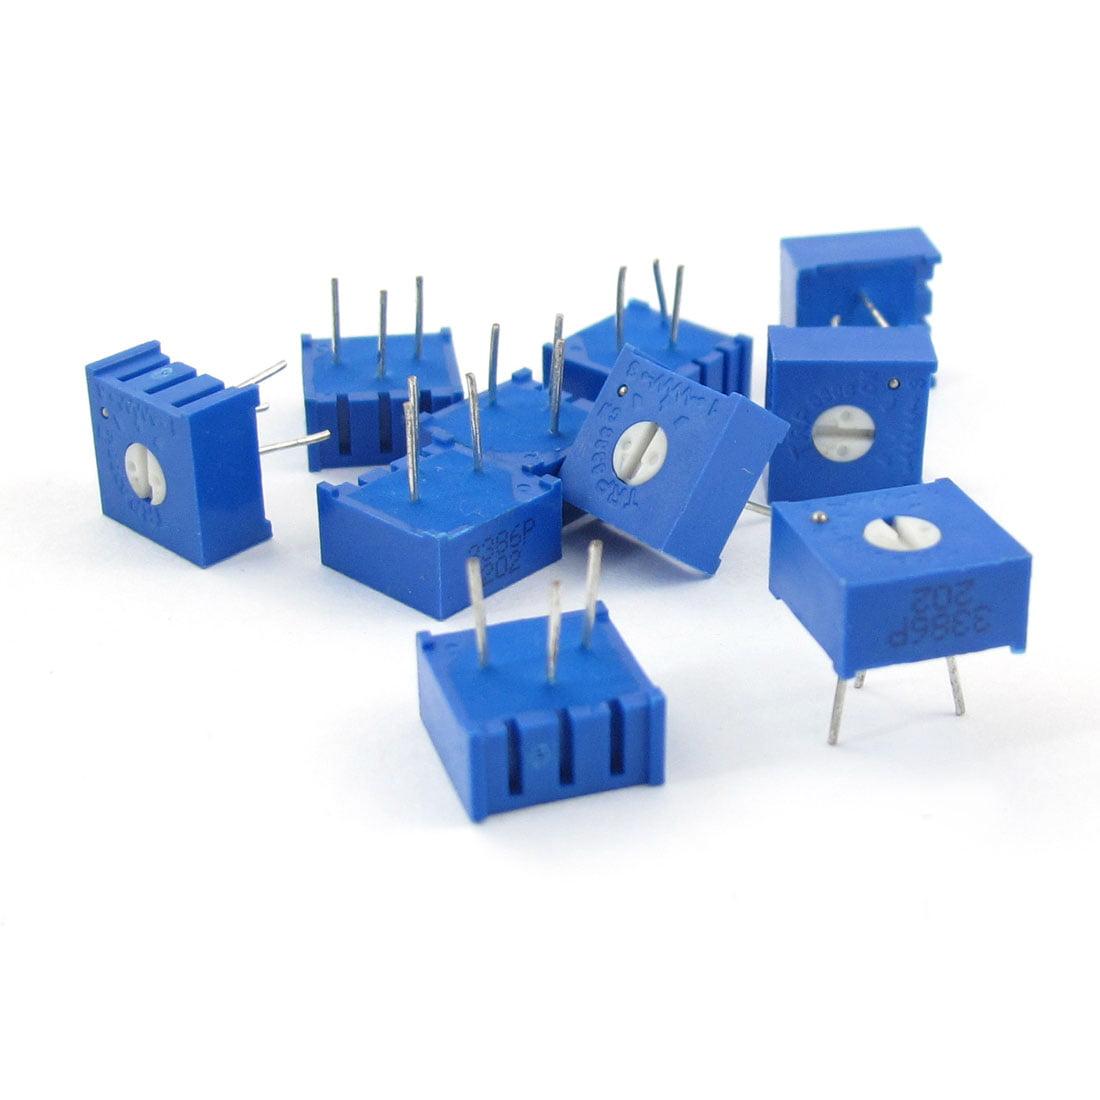 Unique Bargains 10 x 3386P 202 2K Ohm Single Turn Design Potentiometer Trimmer Variable Resistor - image 1 of 1